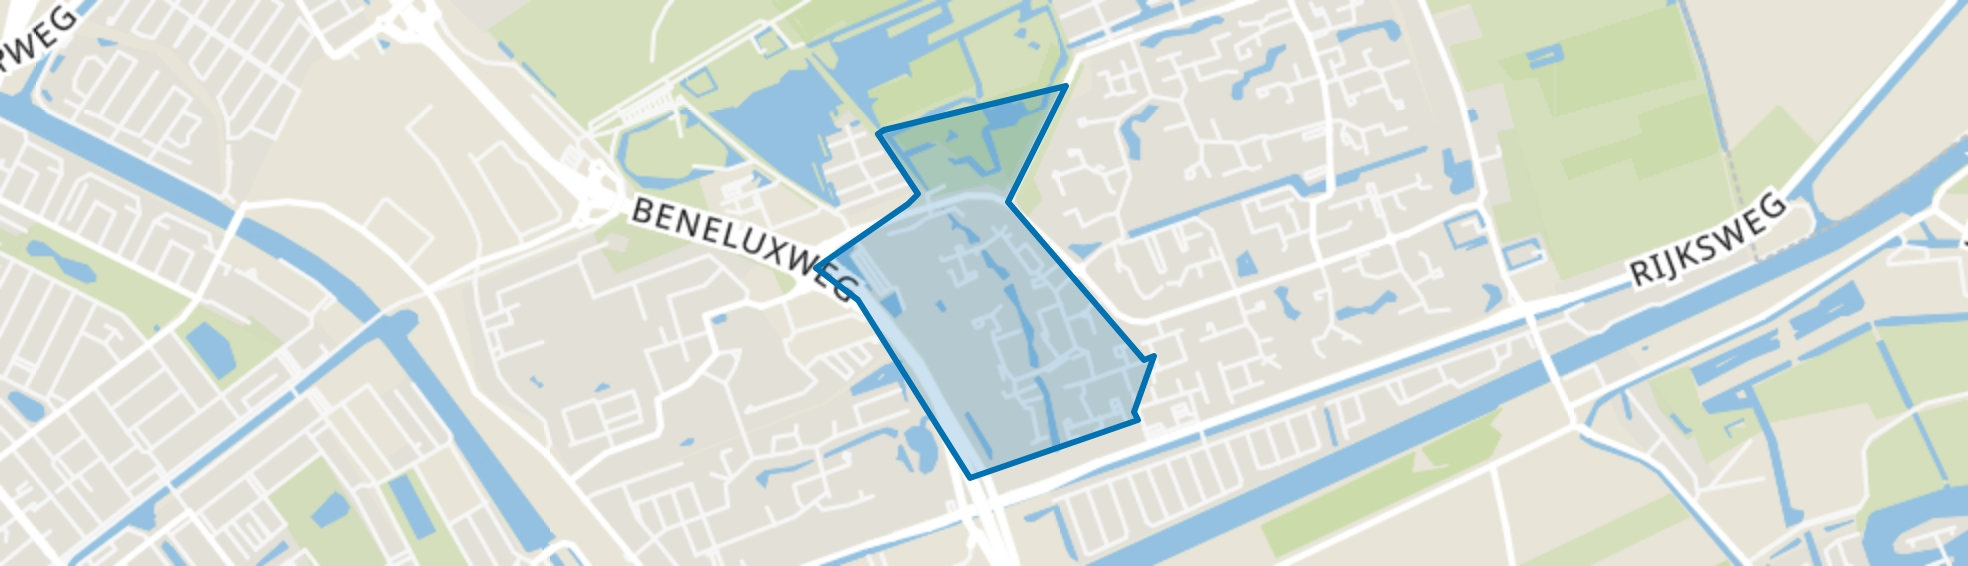 Lewenborg-West, Groningen map